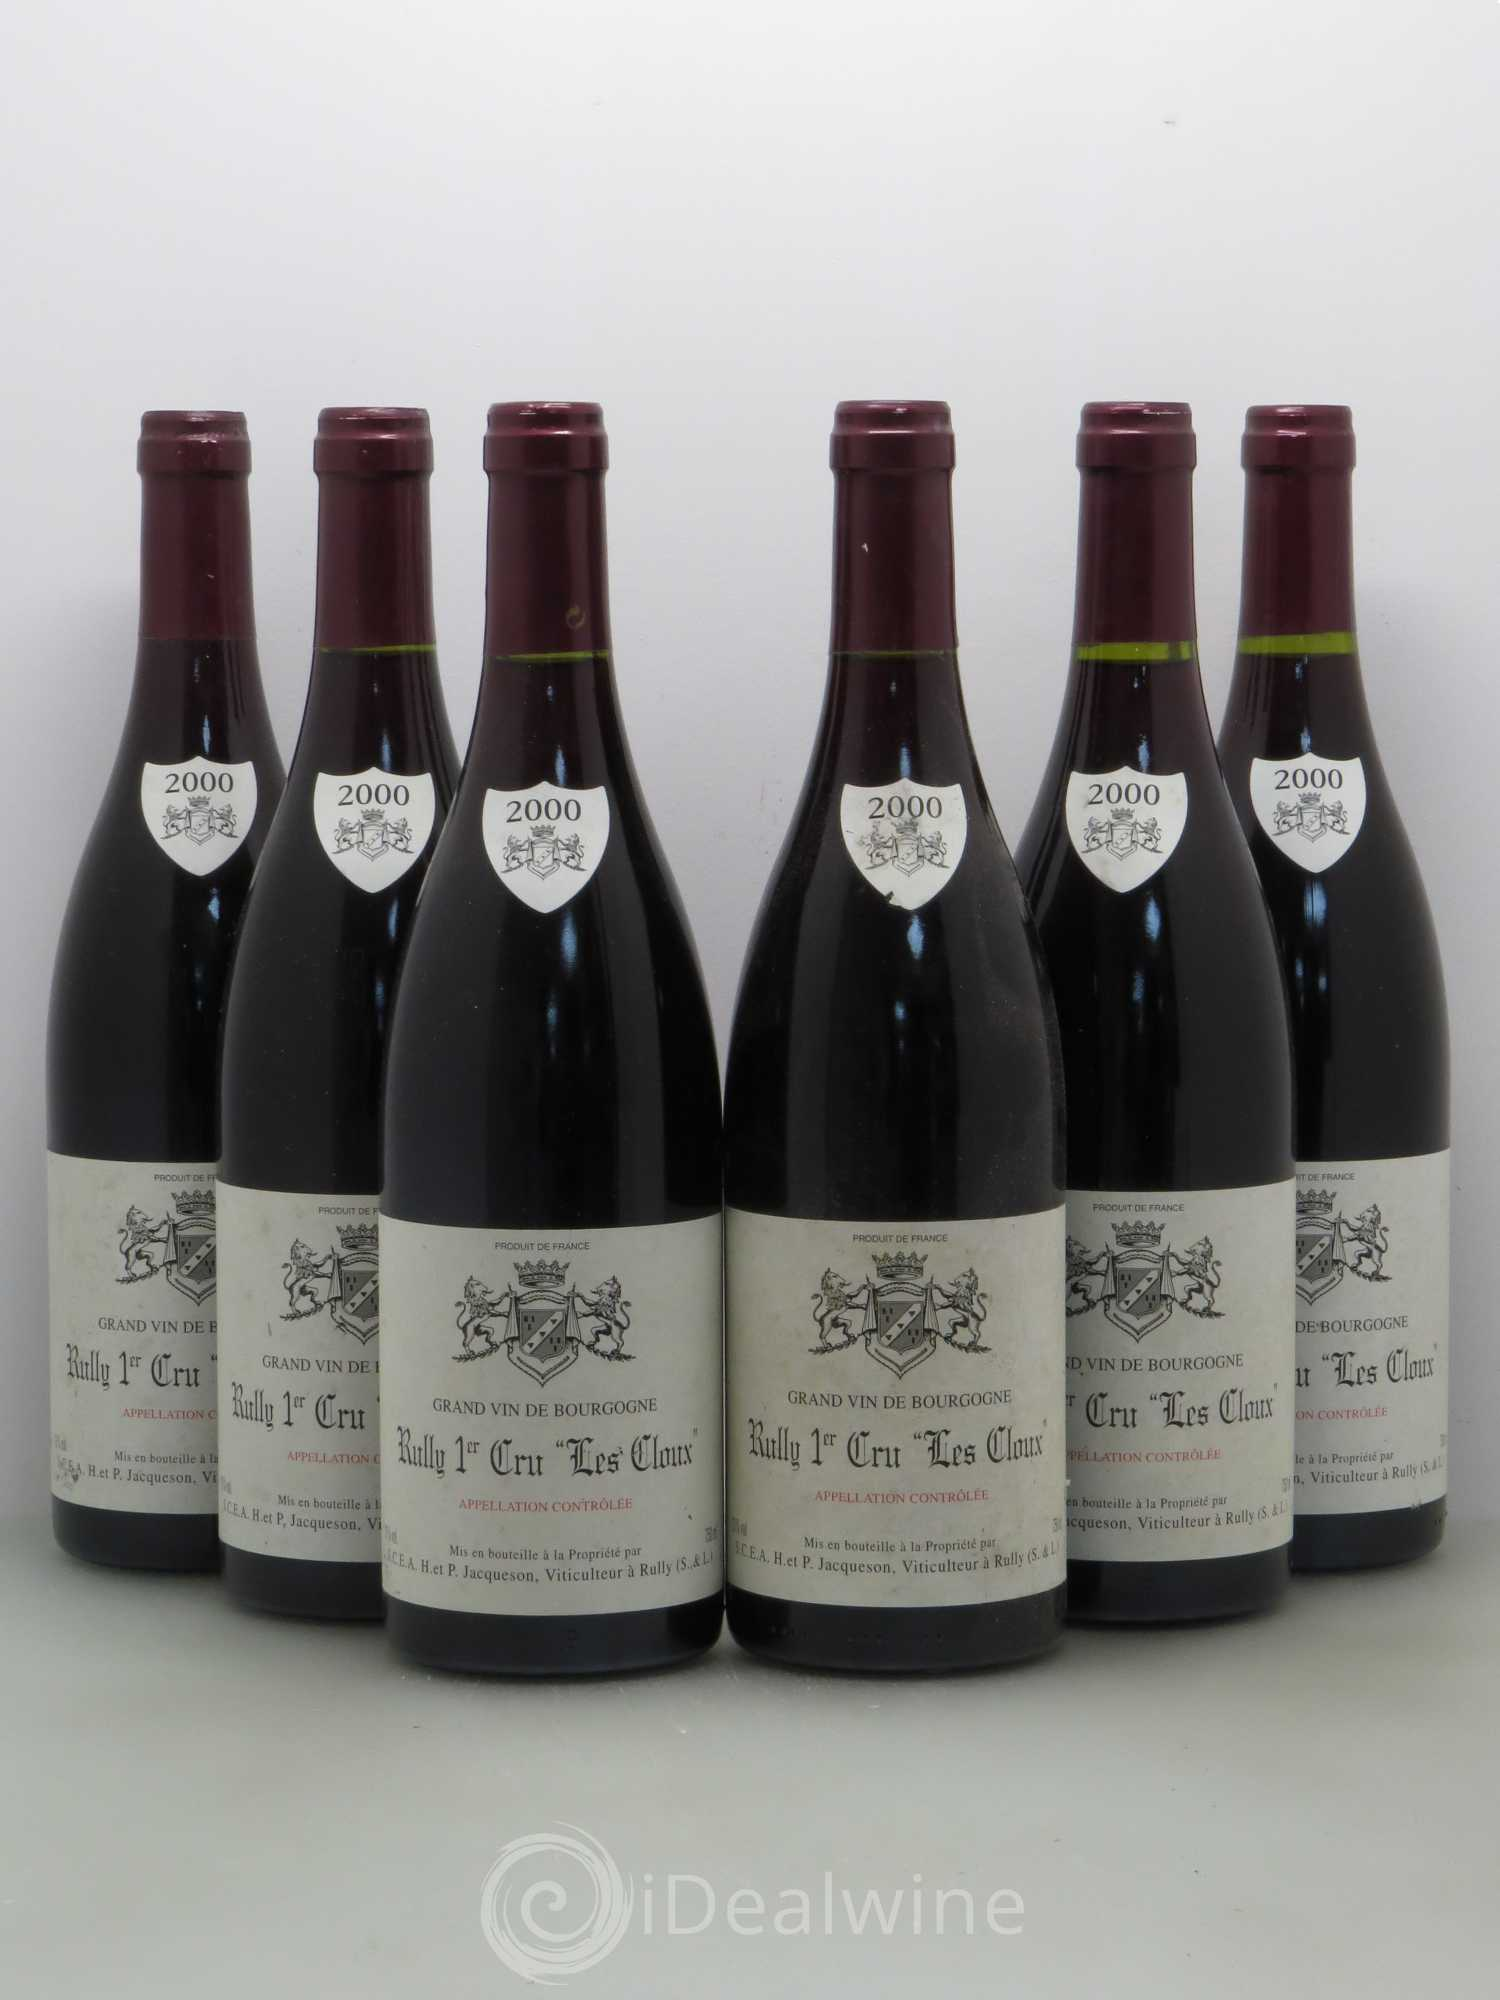 Rully 1er Cru Les Cloux Paul   Marie Jacqueson 2000 - Lot of 6 Bottles 25beabb2f4a4